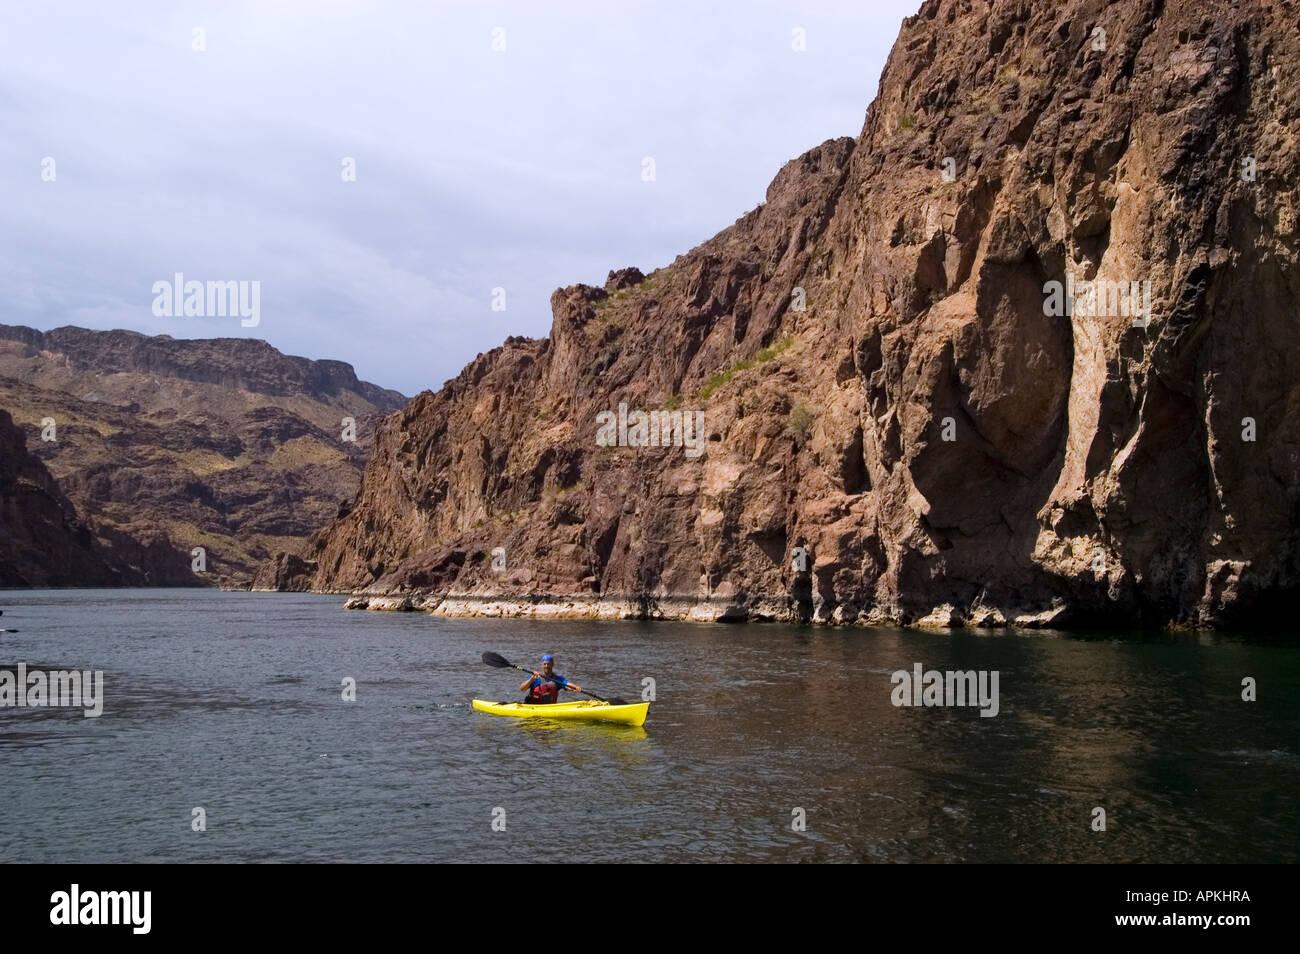 Kayaking No Model Release On The Colorado River Below Hoover Dam On Border Of Arizona Az Nevada Nv